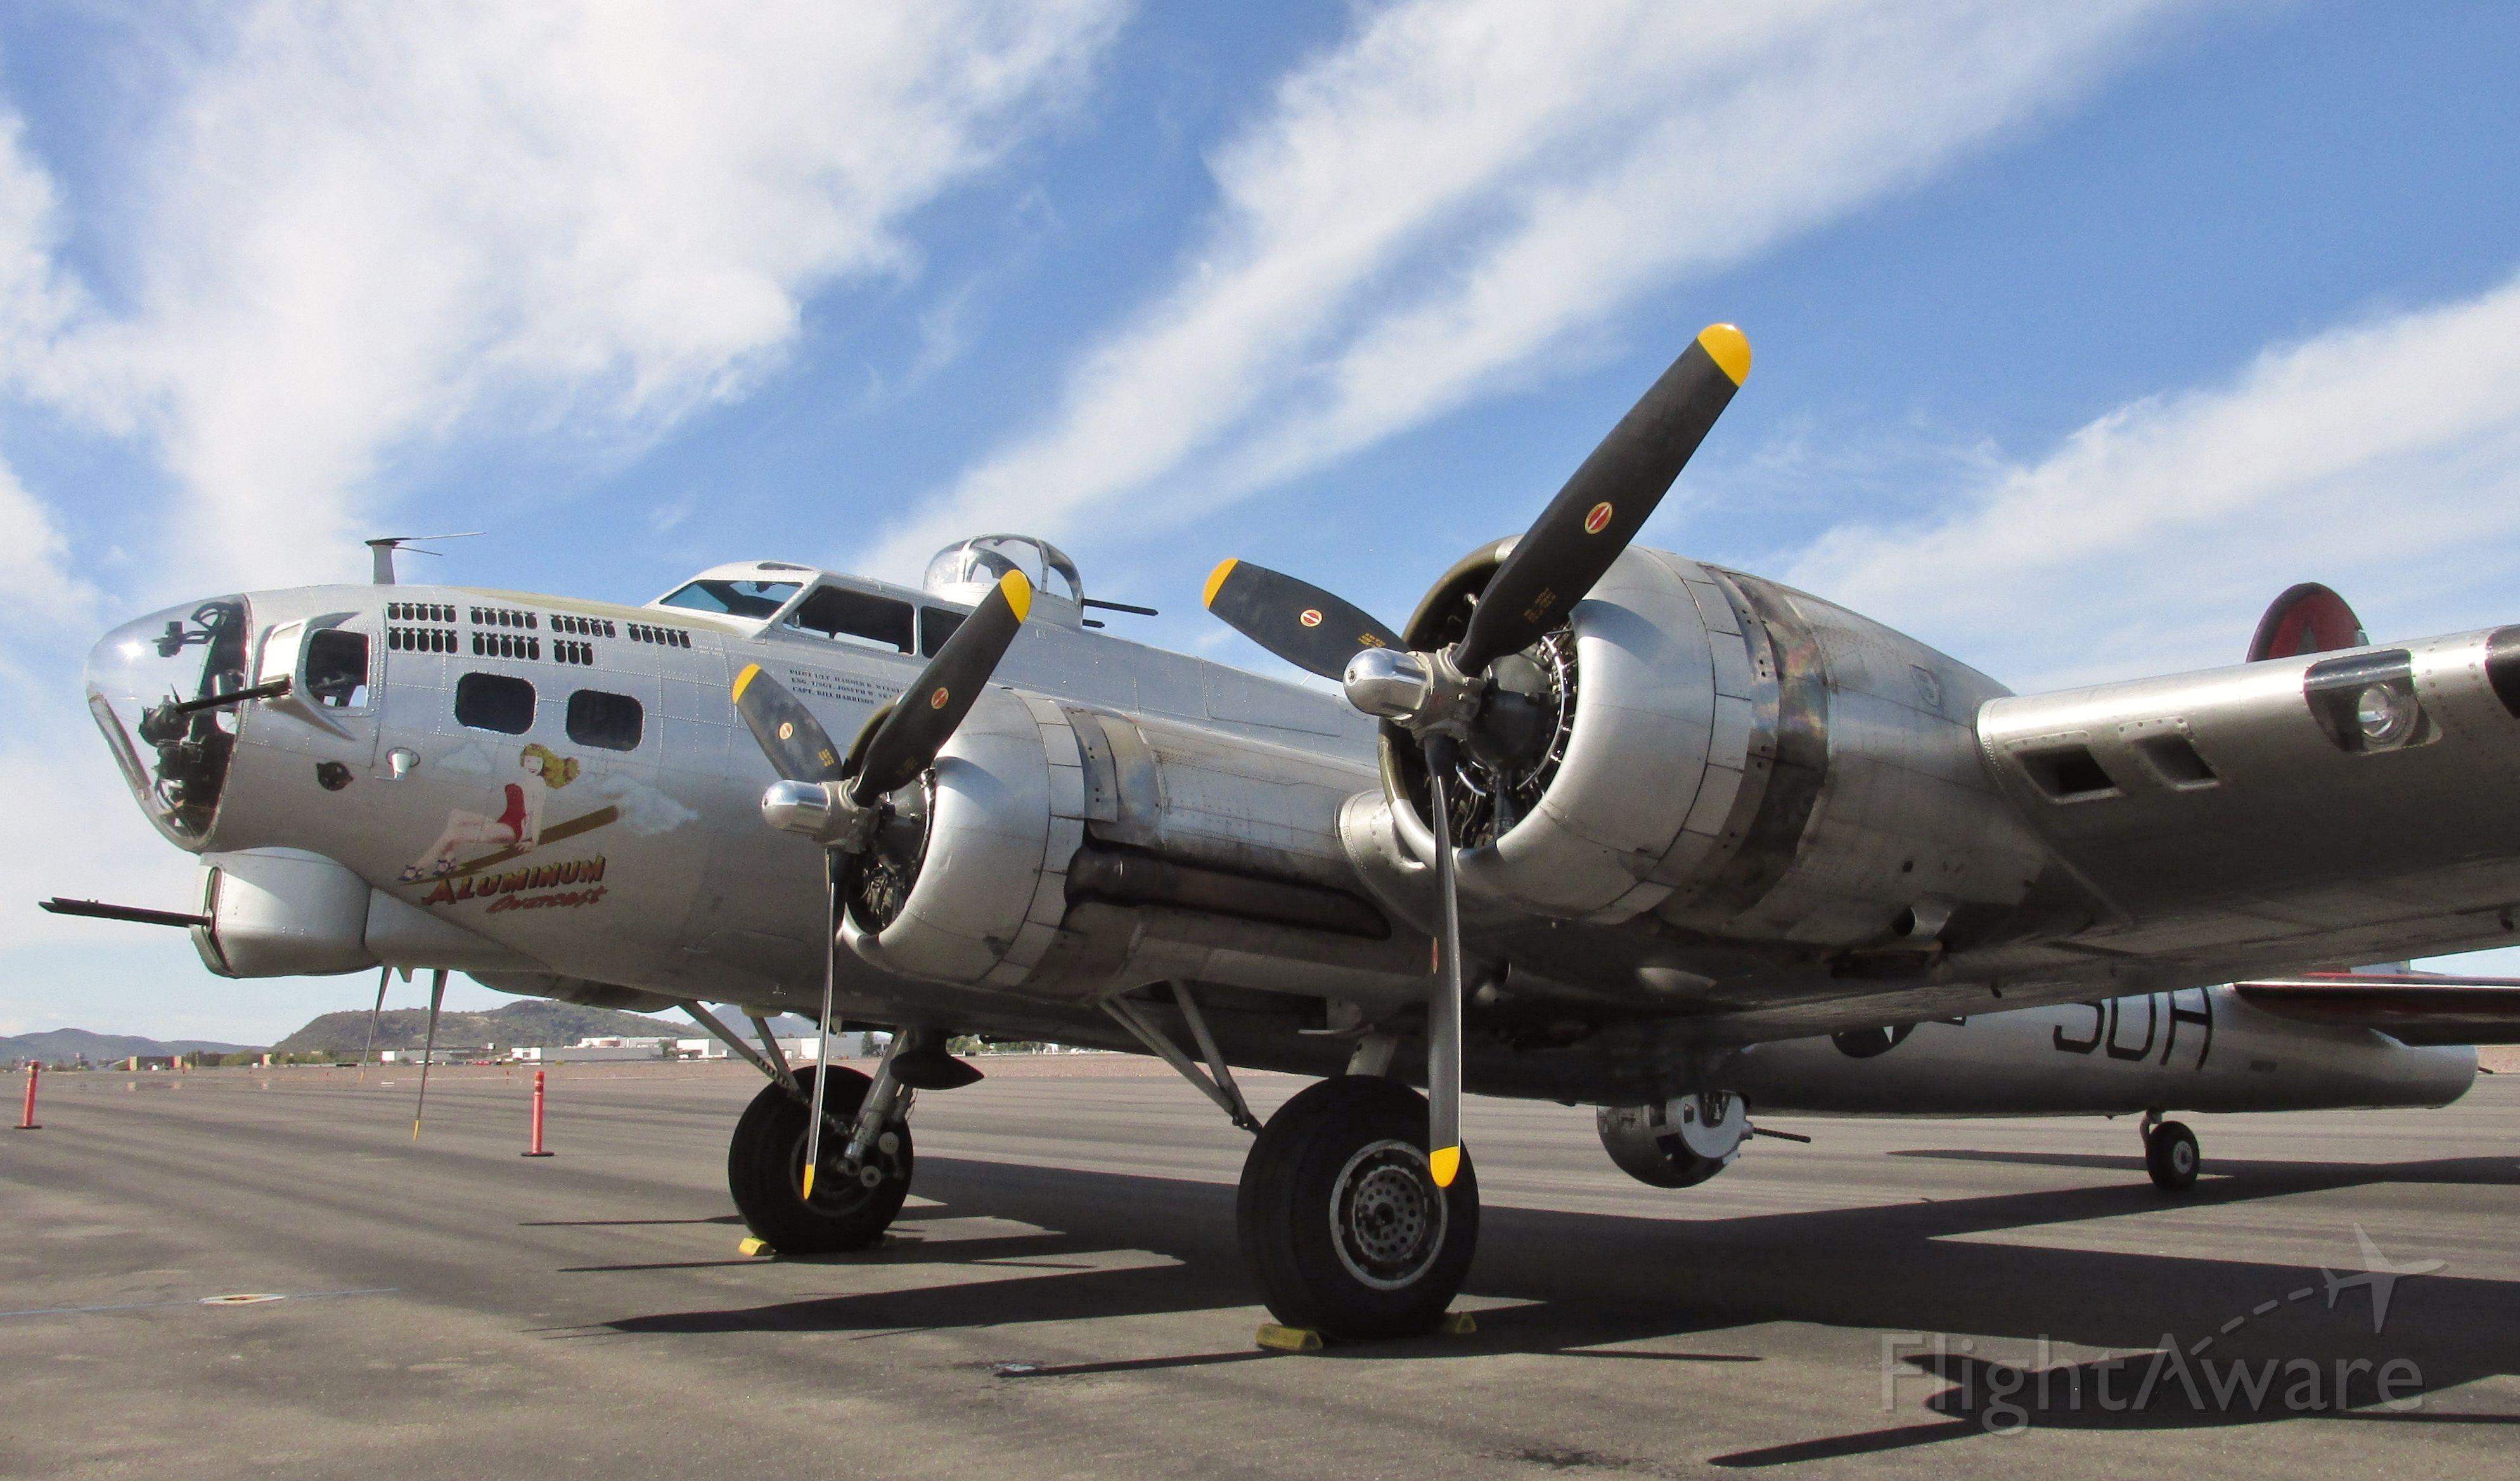 Boeing B-17 Flying Fortress (N5017N) - Aluminum Overcast, EAA